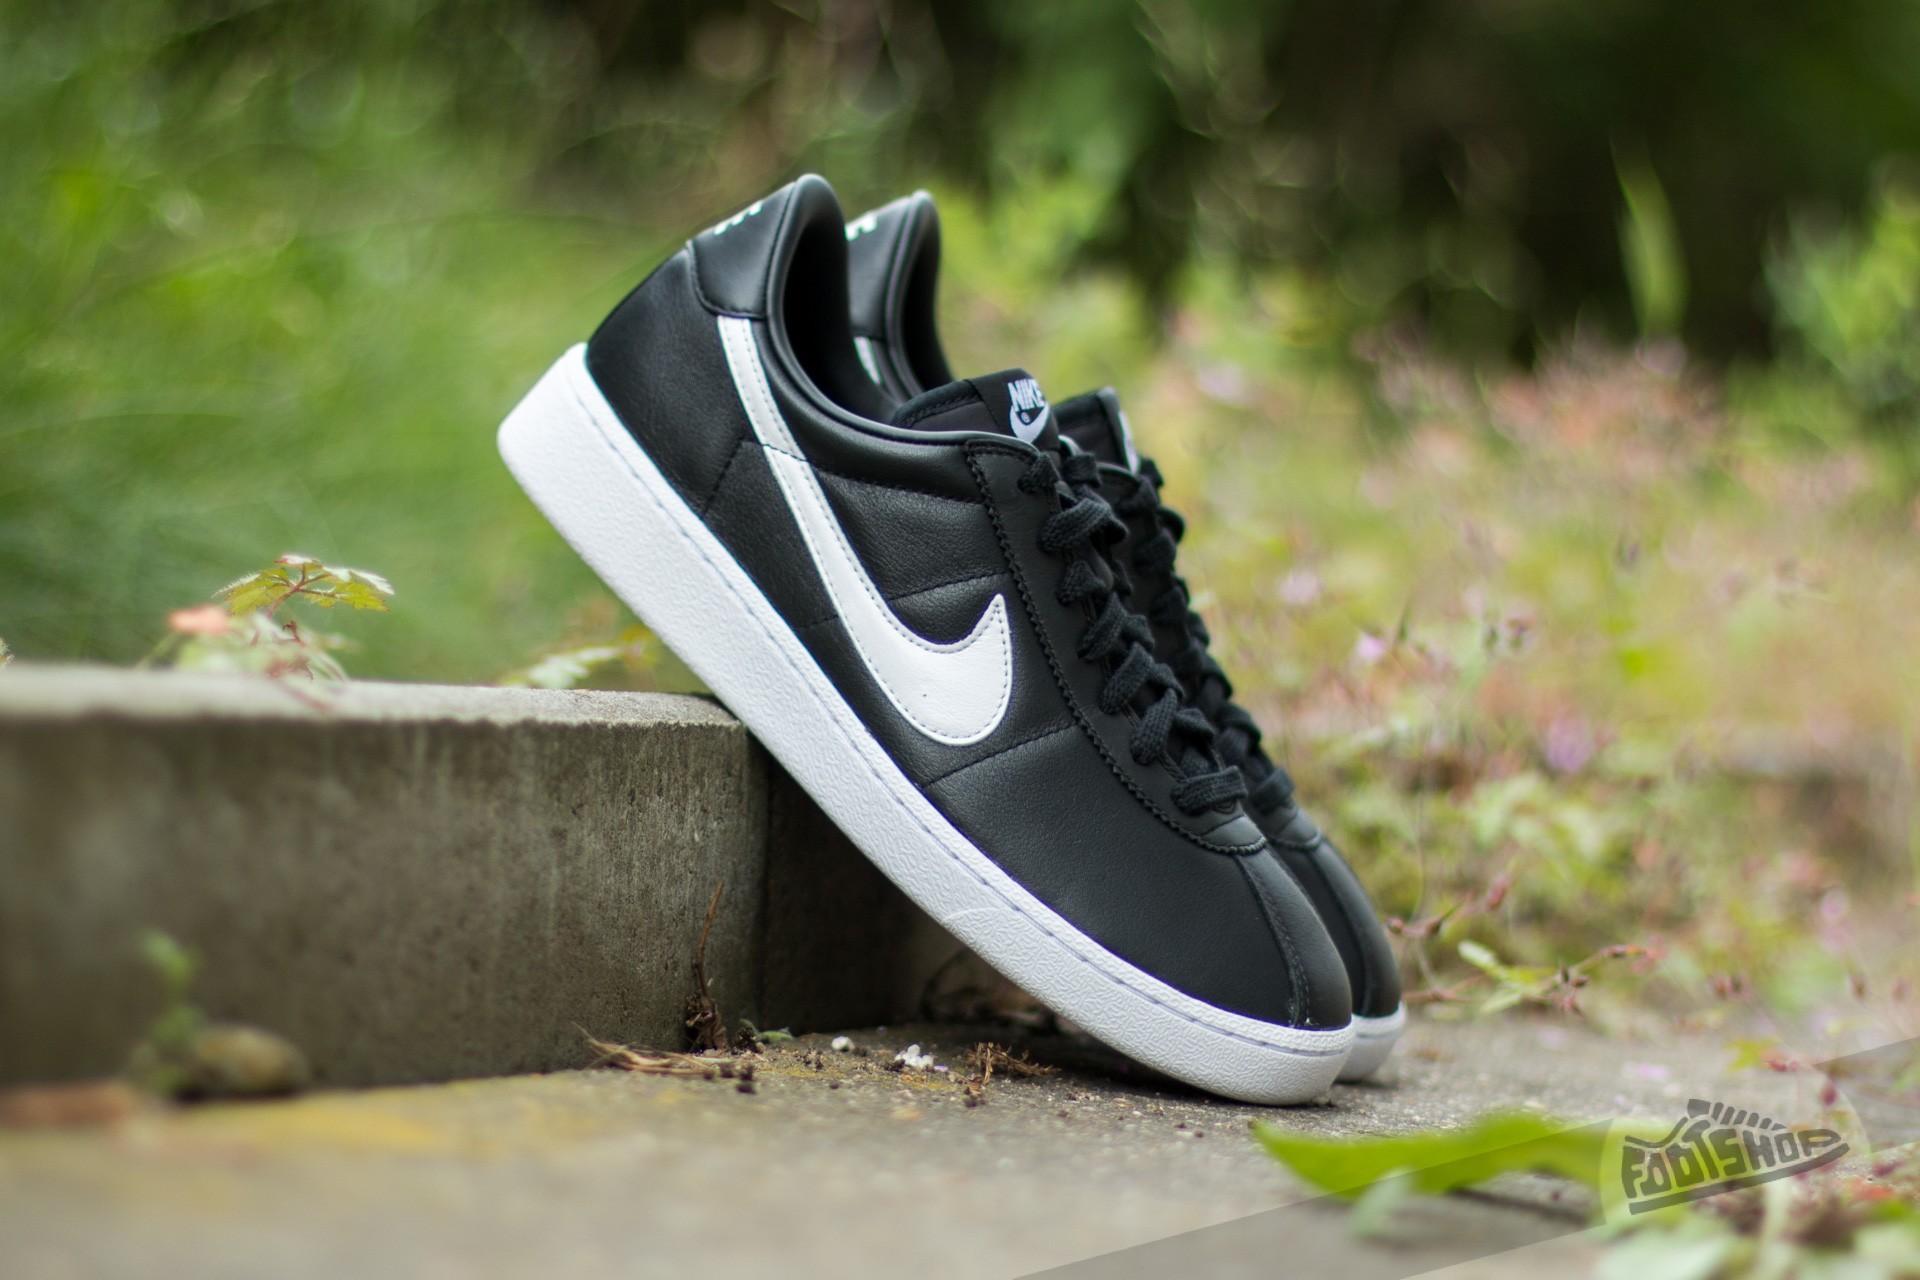 8b5b4fcf9e1 Nike Bruin QS Black  White-Black